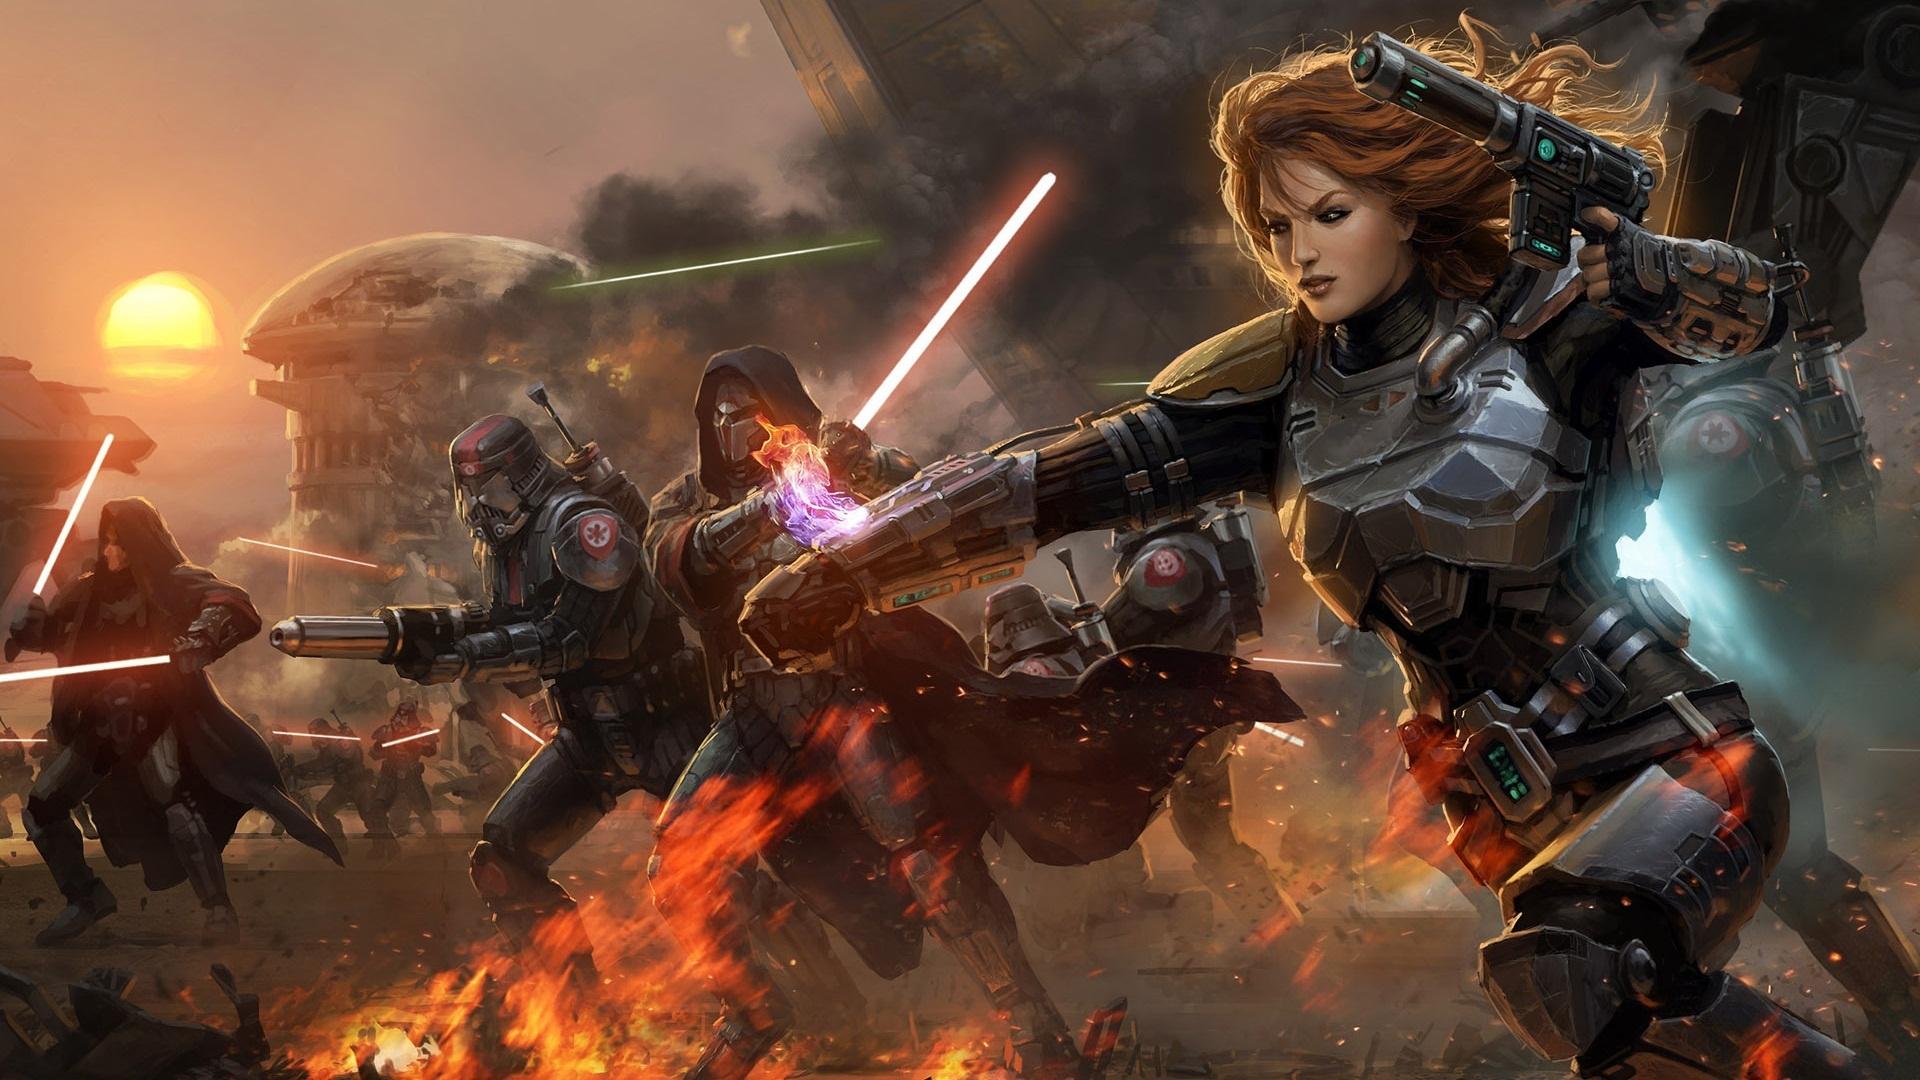 la collection star wars jeux vidéo star wars: the old republic